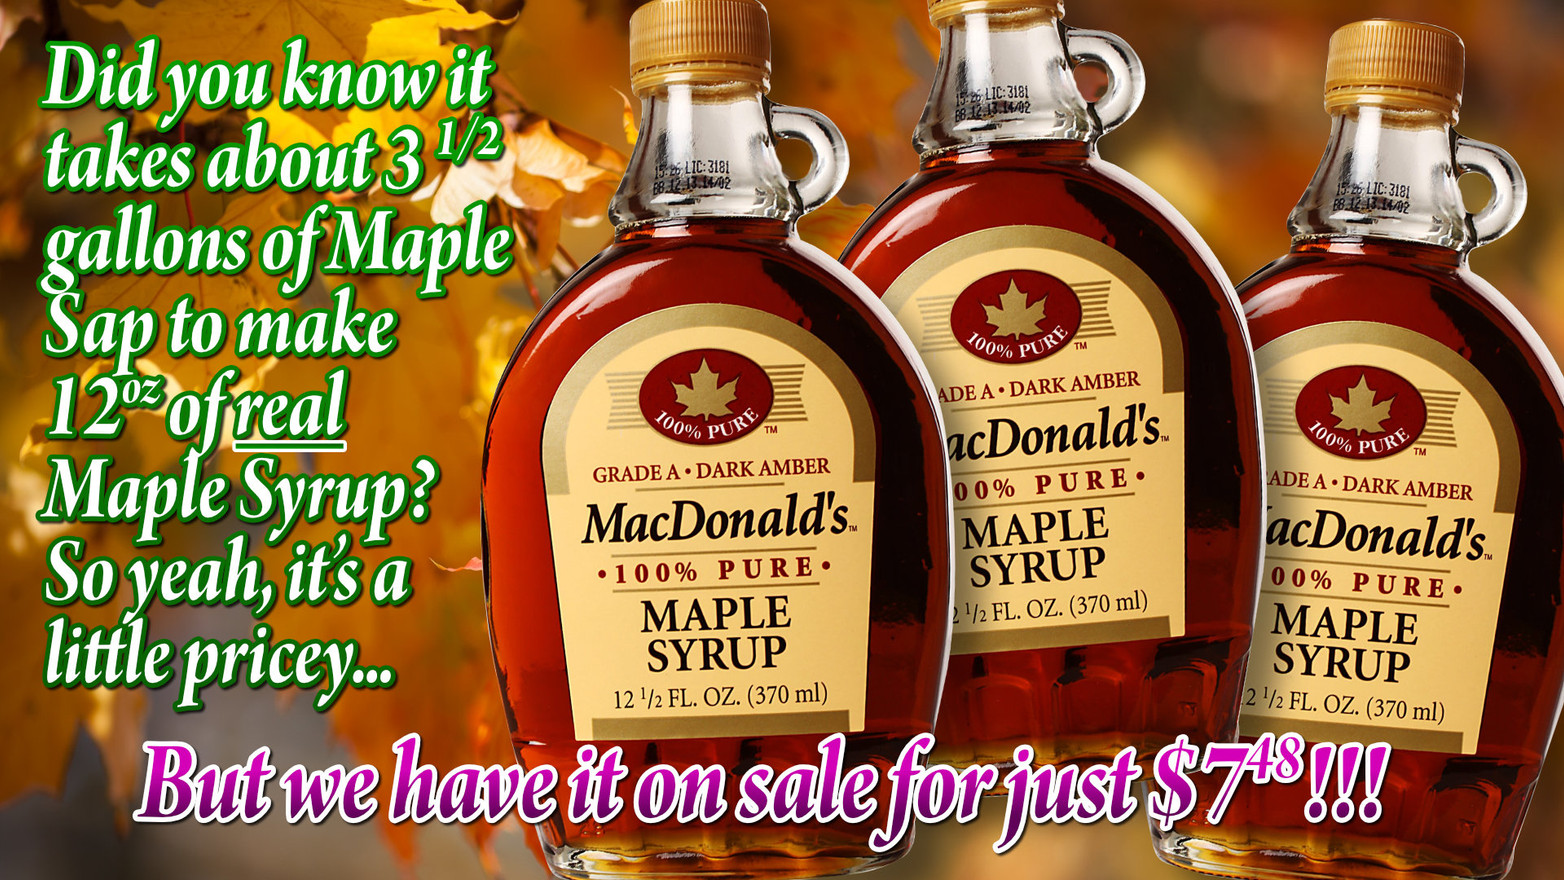 macdonald's maple syrup.jpg